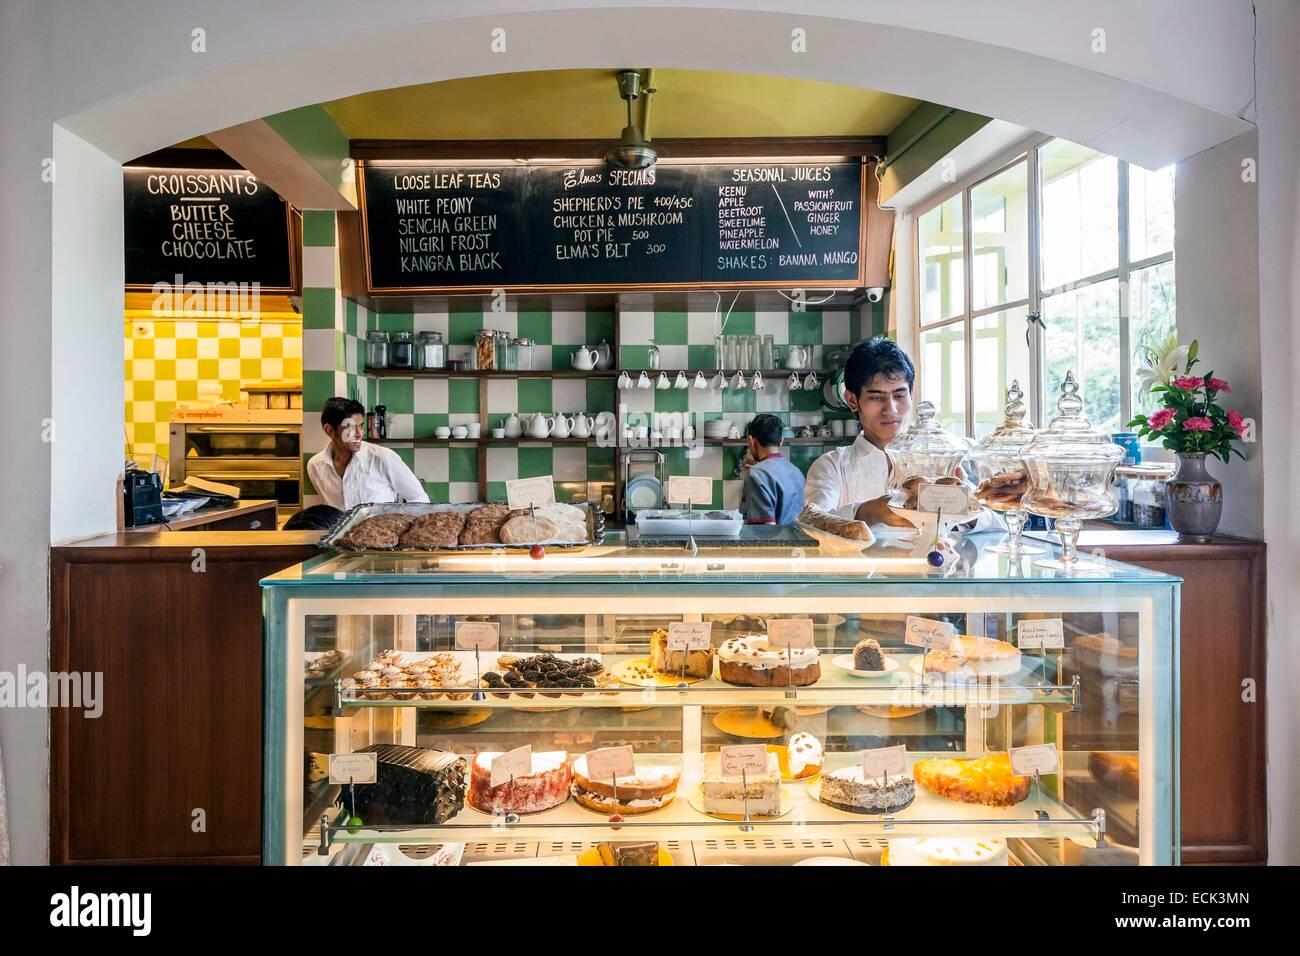 India, New Delhi, Hauz Khas Village, Elma's Tea Room - Stock Image